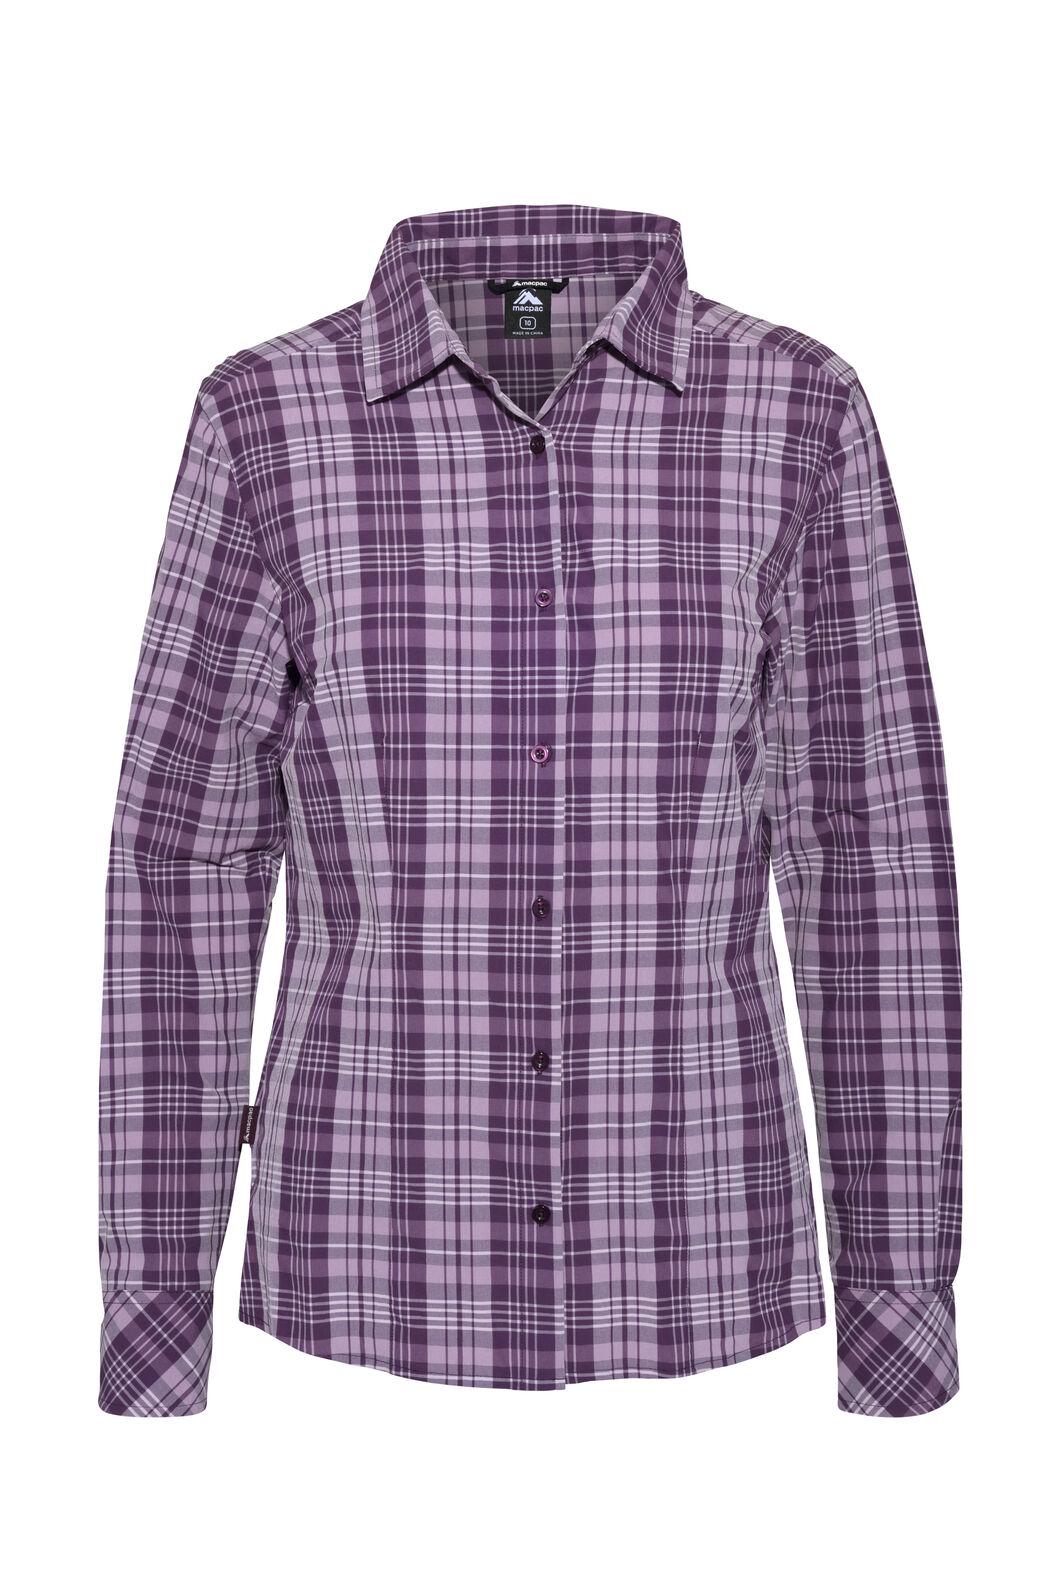 Macpac Eclipse Long Sleeve Shirt — Women's, Blackberry Wine, hi-res